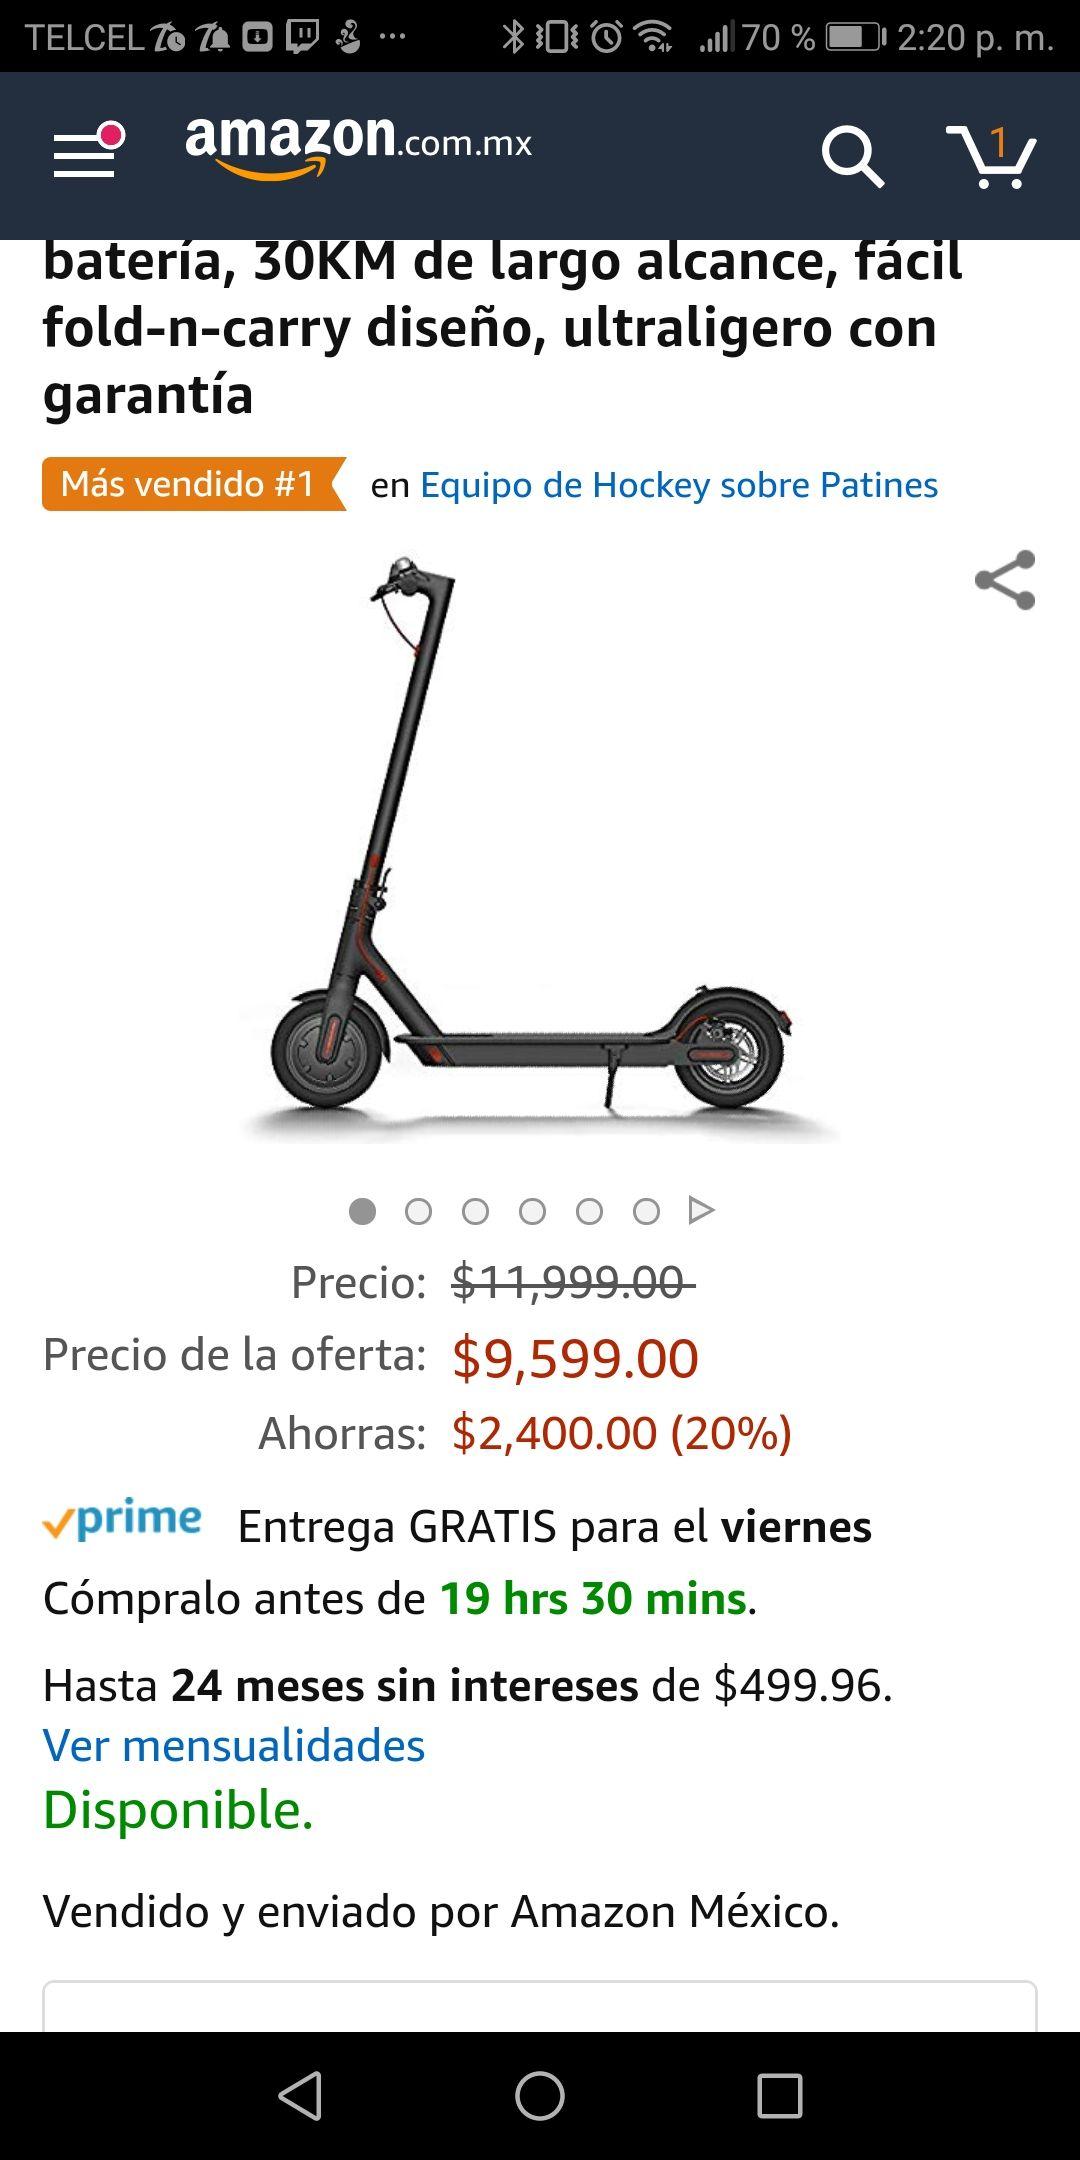 Amazon: xiaomi mi scotter vendido por Amazon pagando con BBVA Wallet (oferta flash)